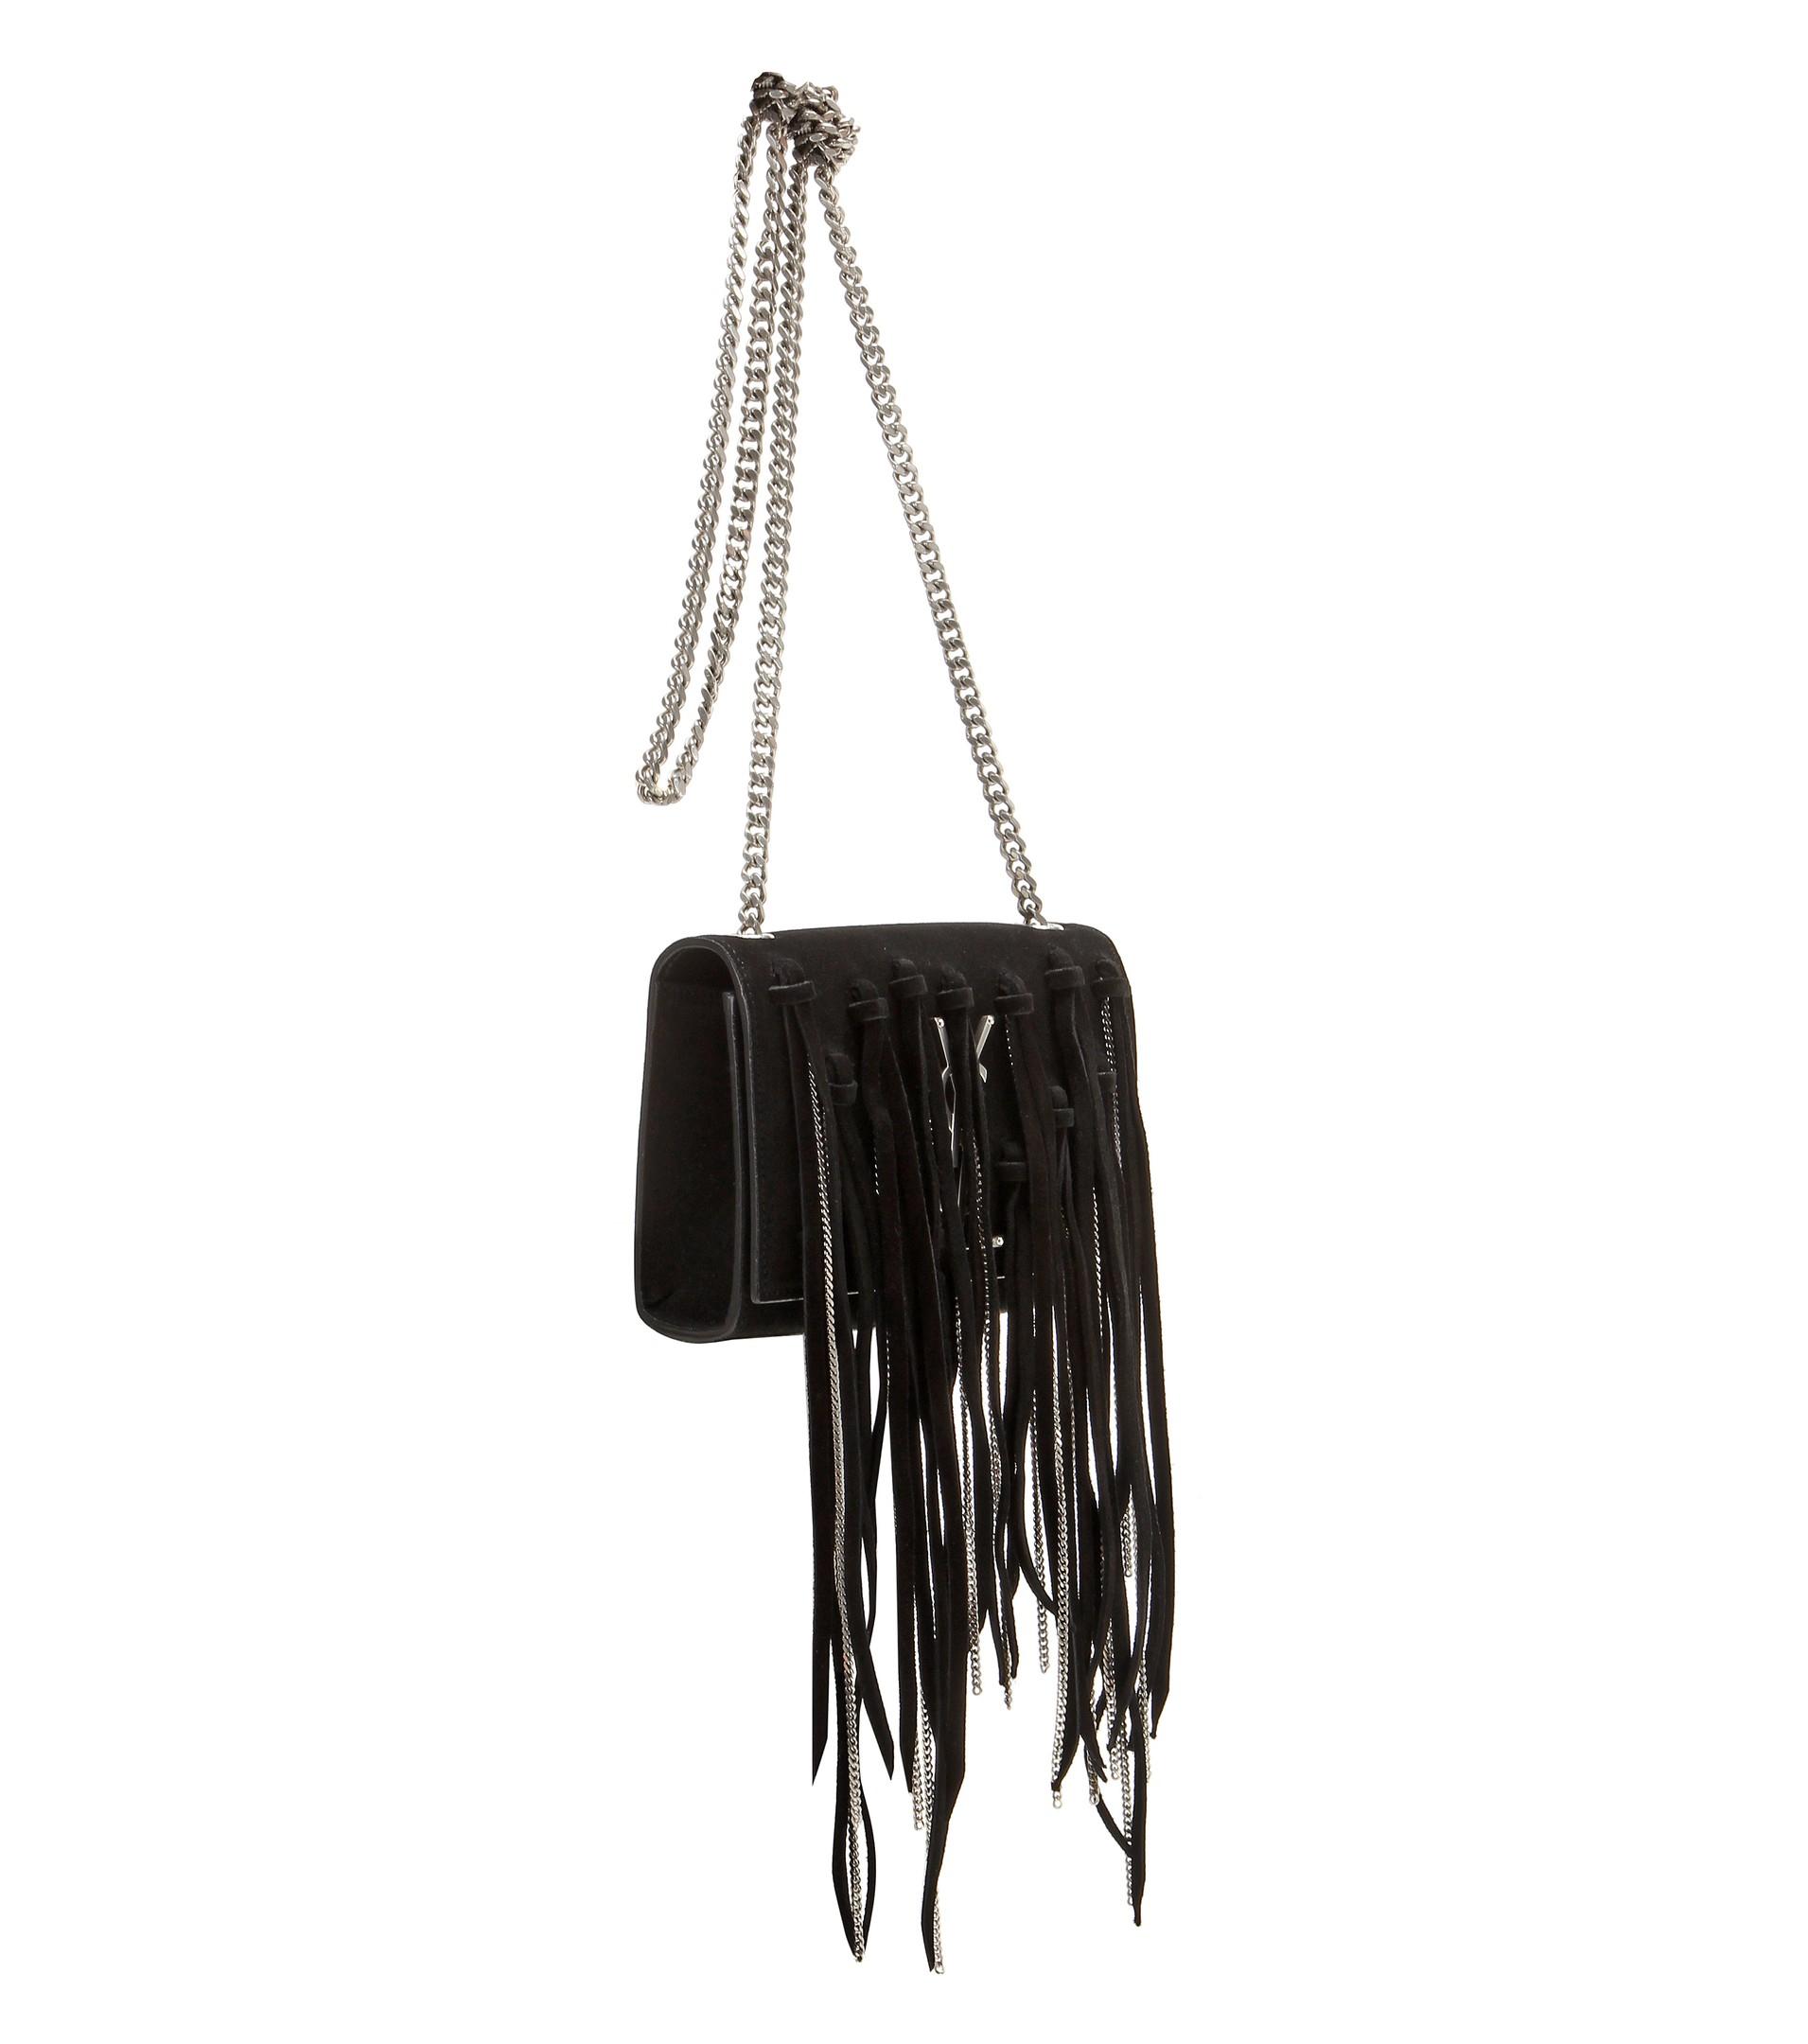 yves saint laurent small monogramme suede chain tassel bag